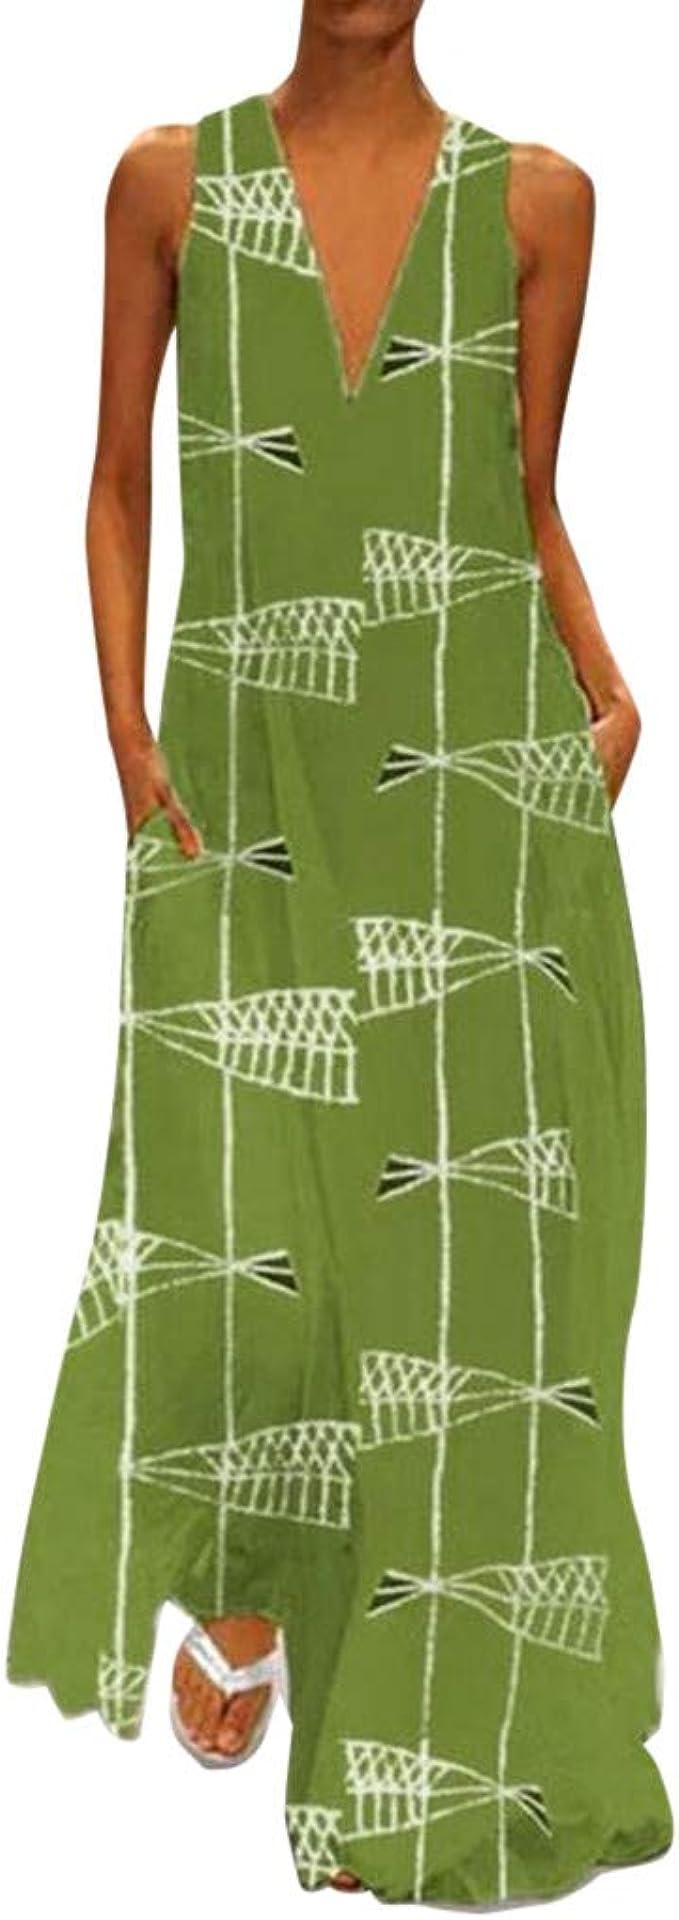 Dress for Women Maxi Dress Stripe Butterfly Printed Robe Summer Casual Sleeveless V-Neck Vintage Pockets Daily Tall Sundress